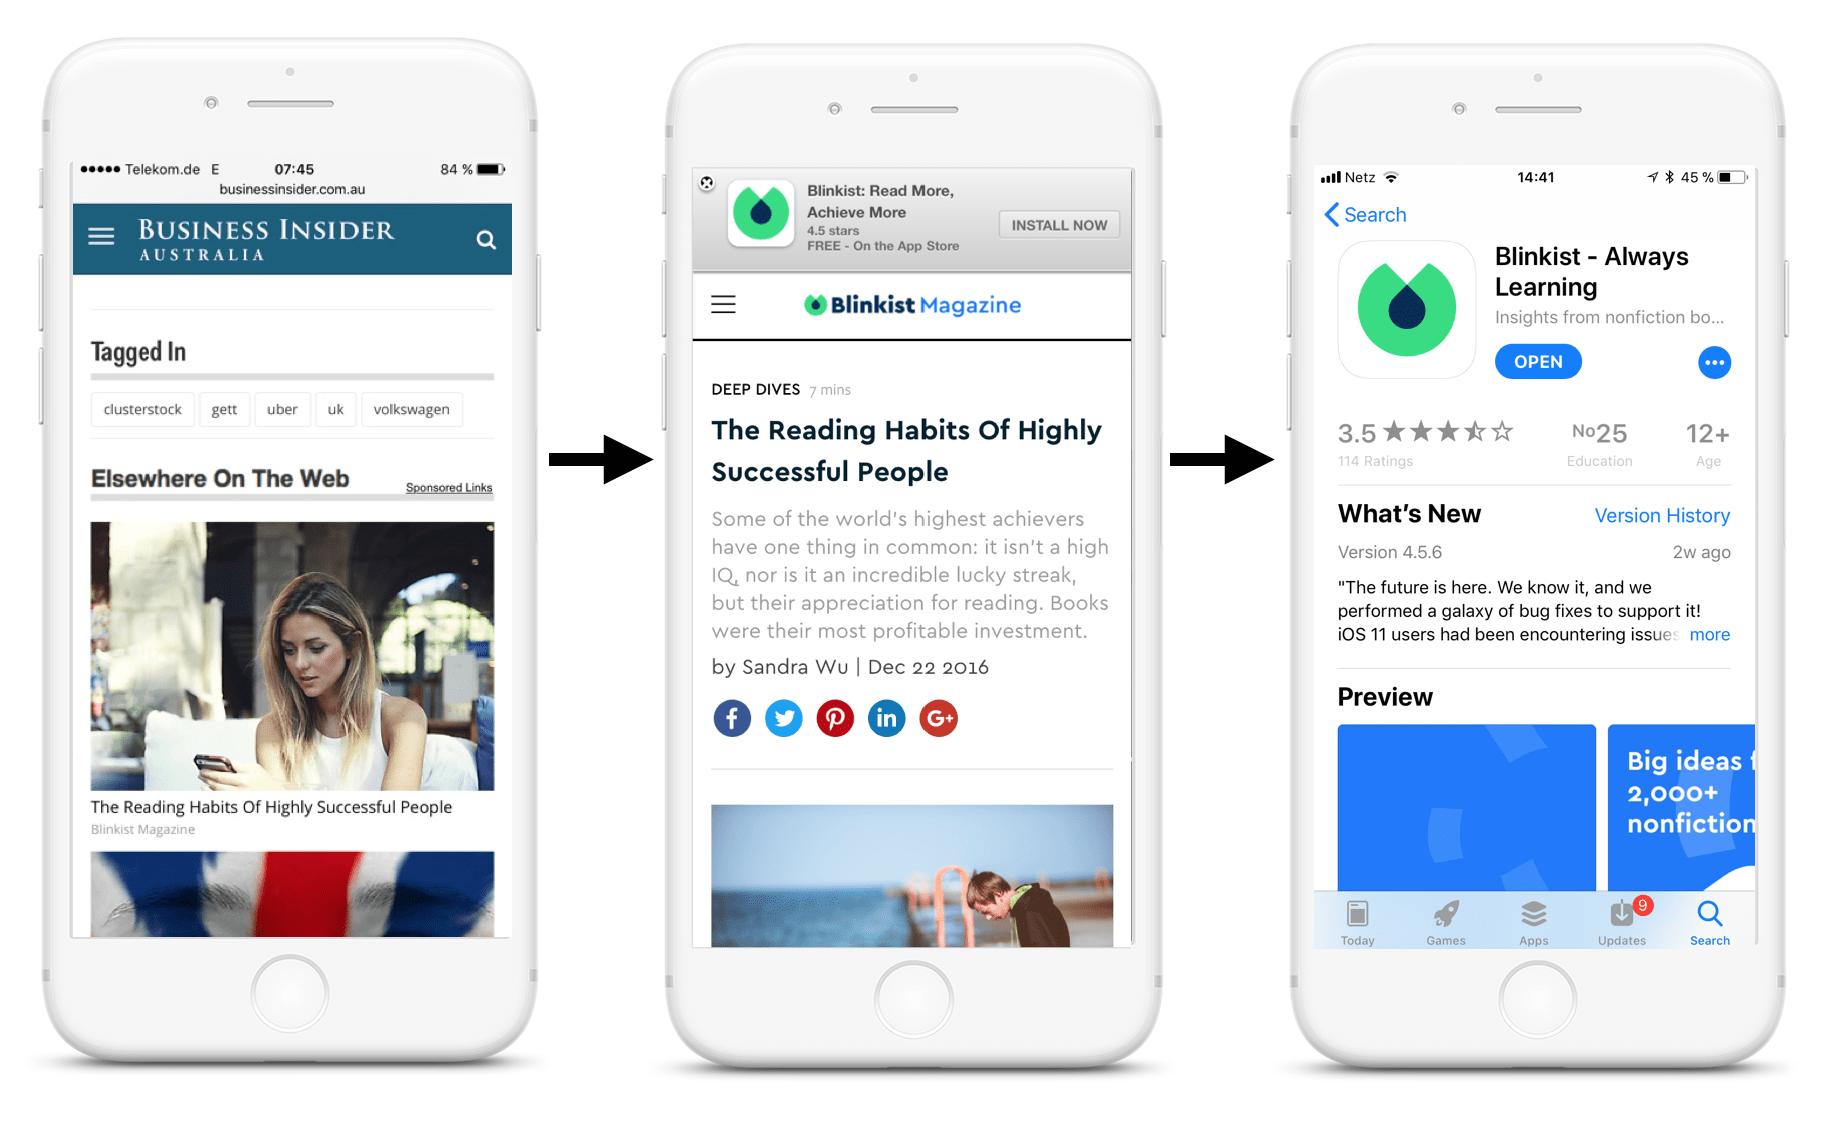 Blinkist's content marketing flow